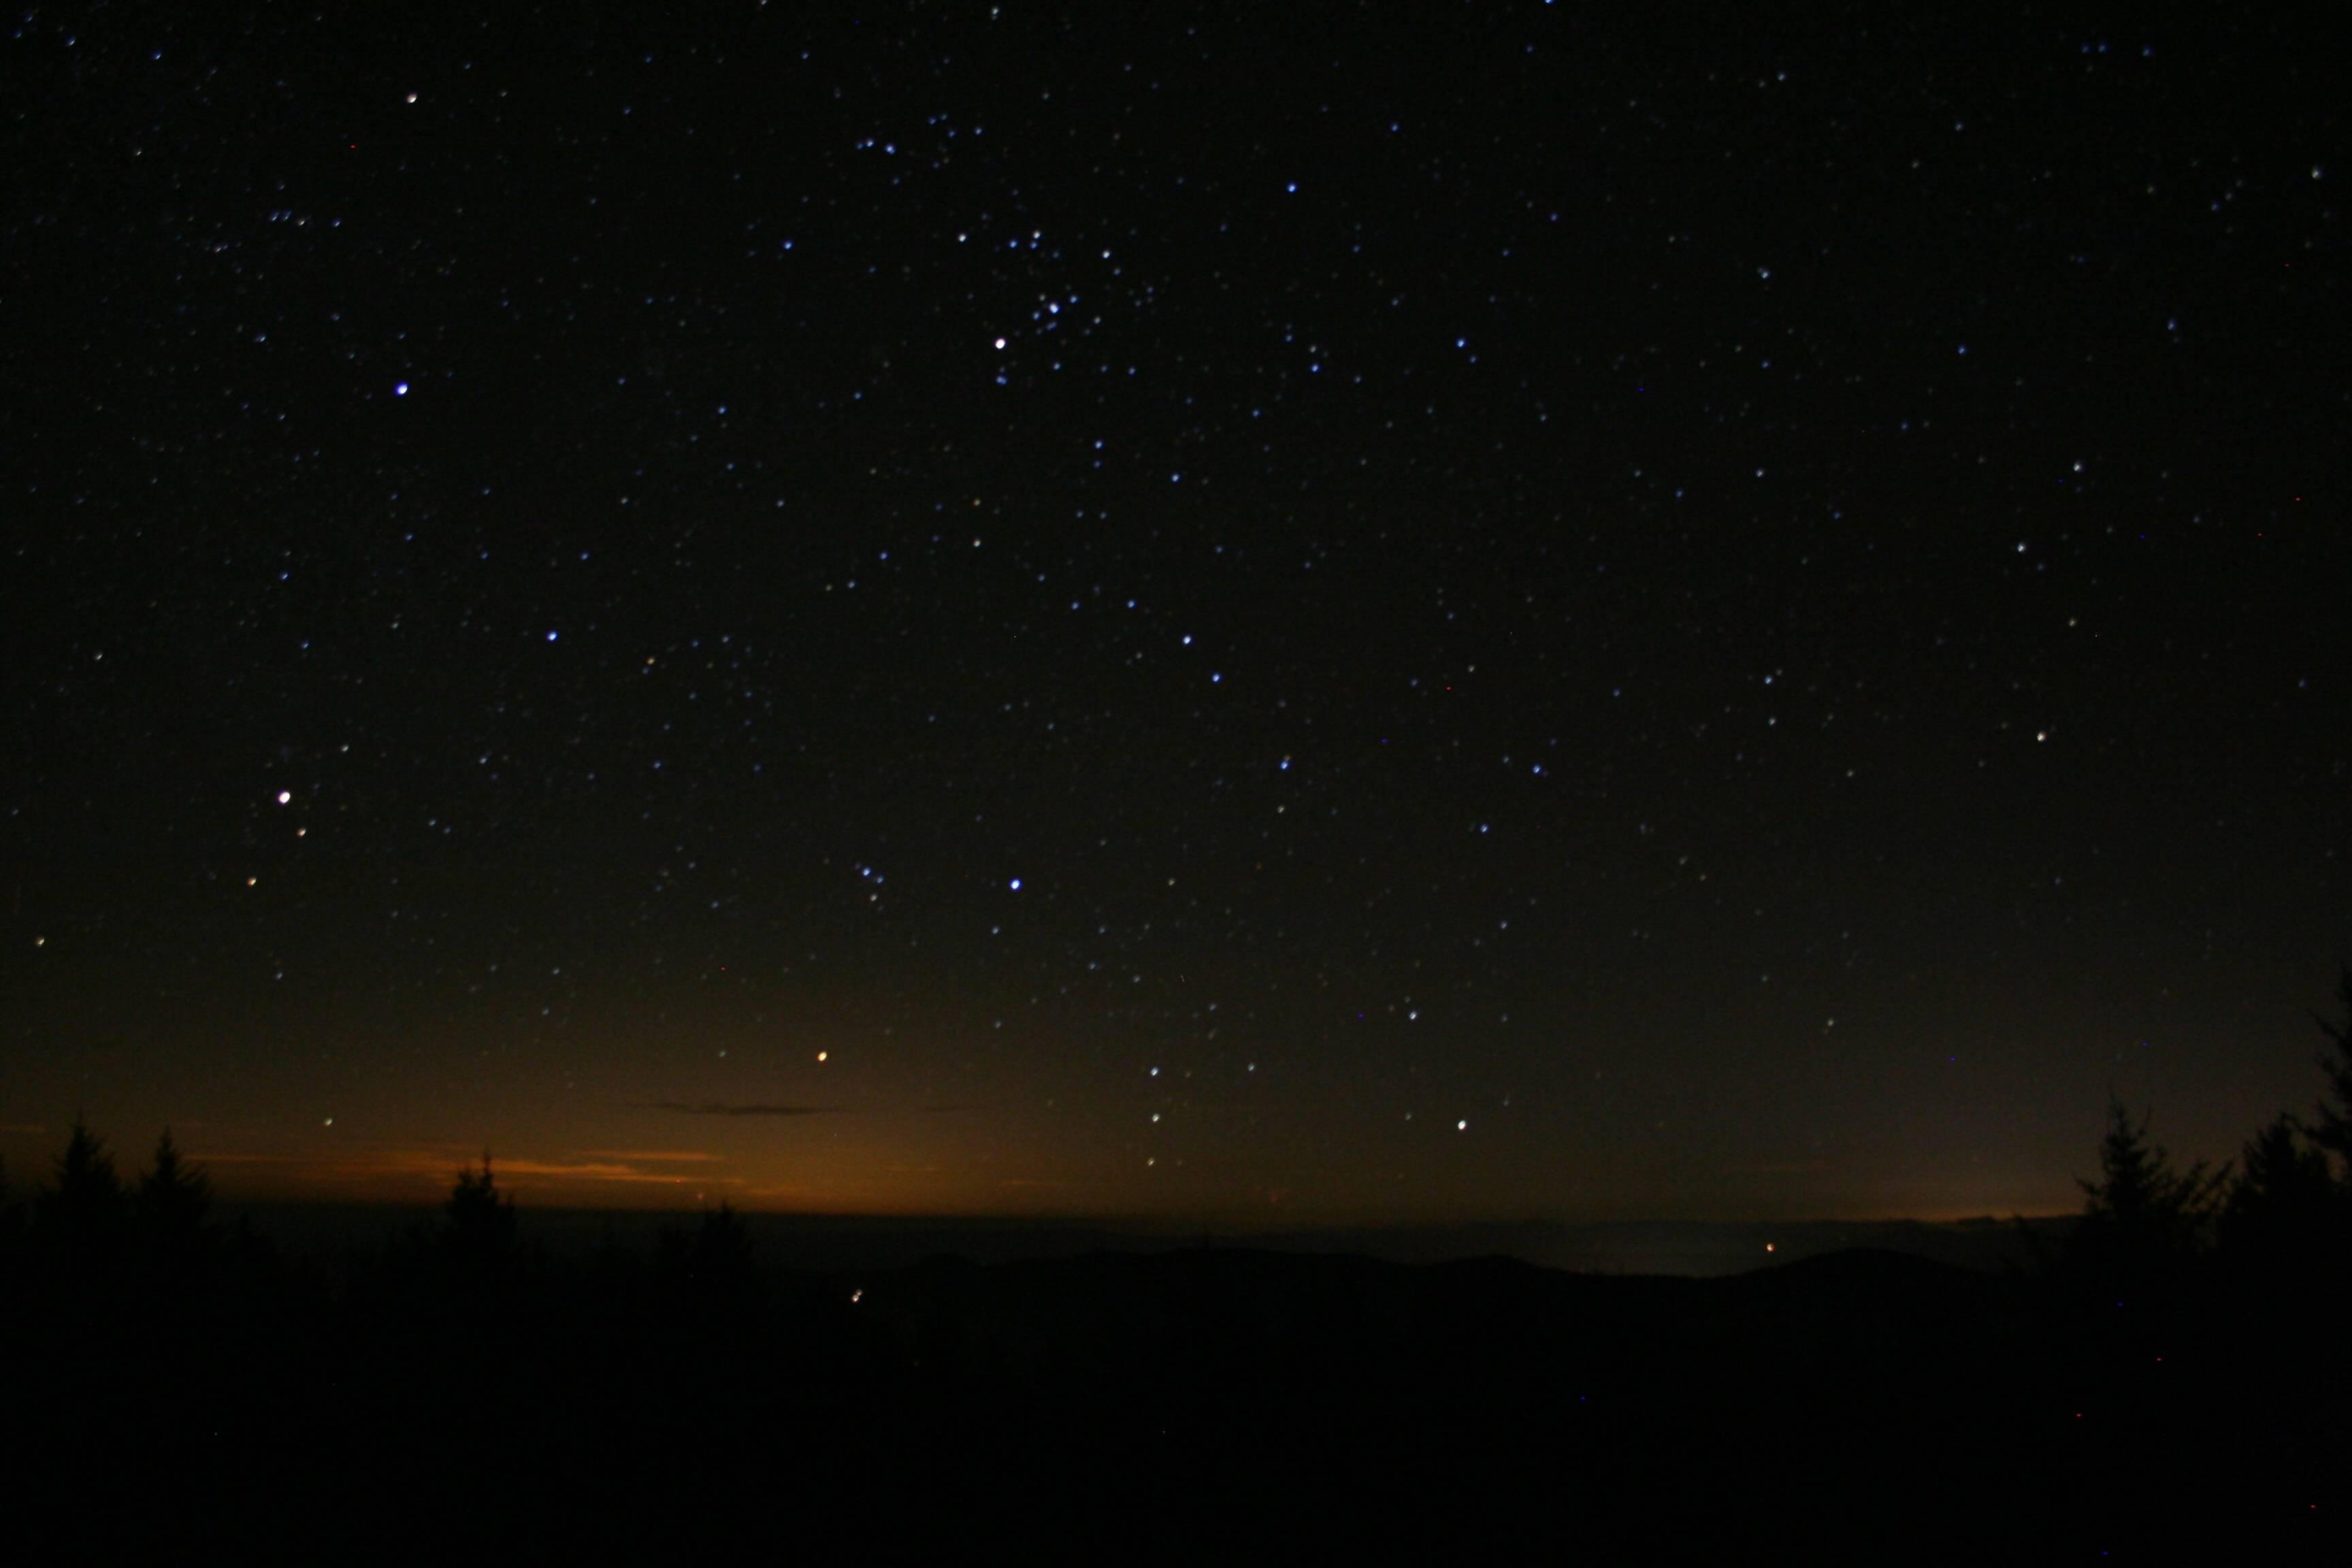 Night Sky Backgrounds 3456x2304